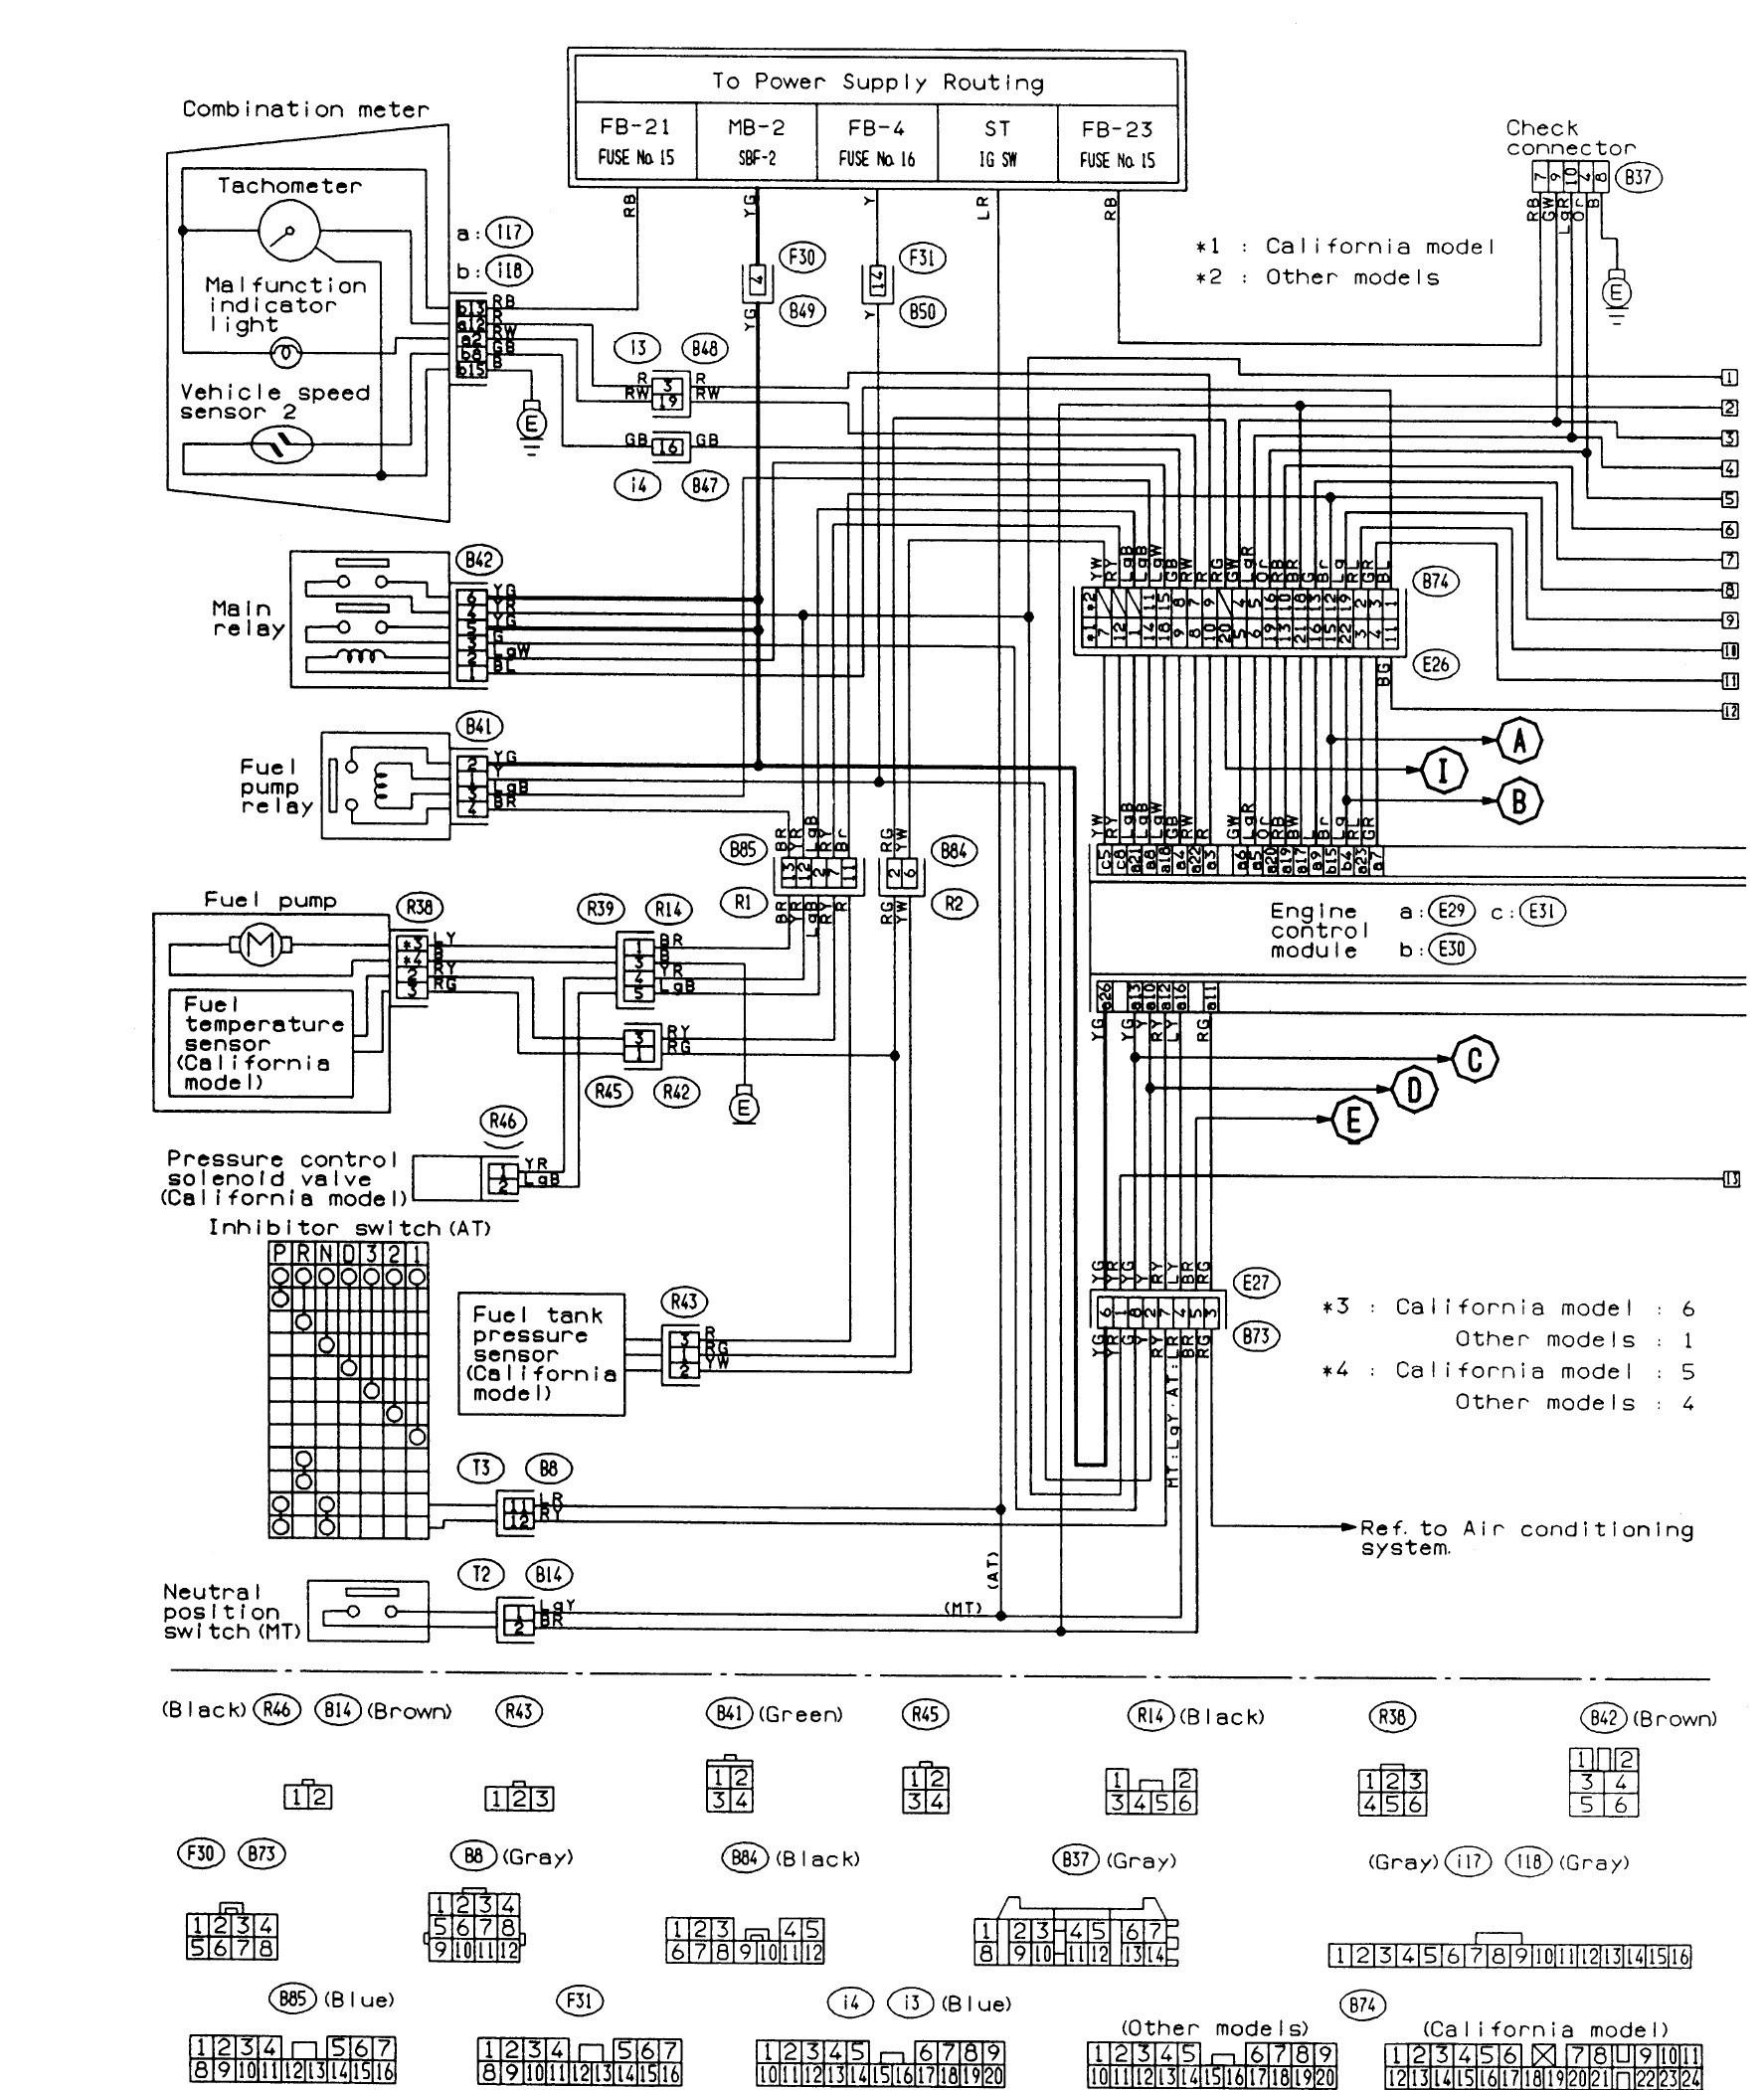 Rockford Fosgate Prime R500 1 Wiring Diagram